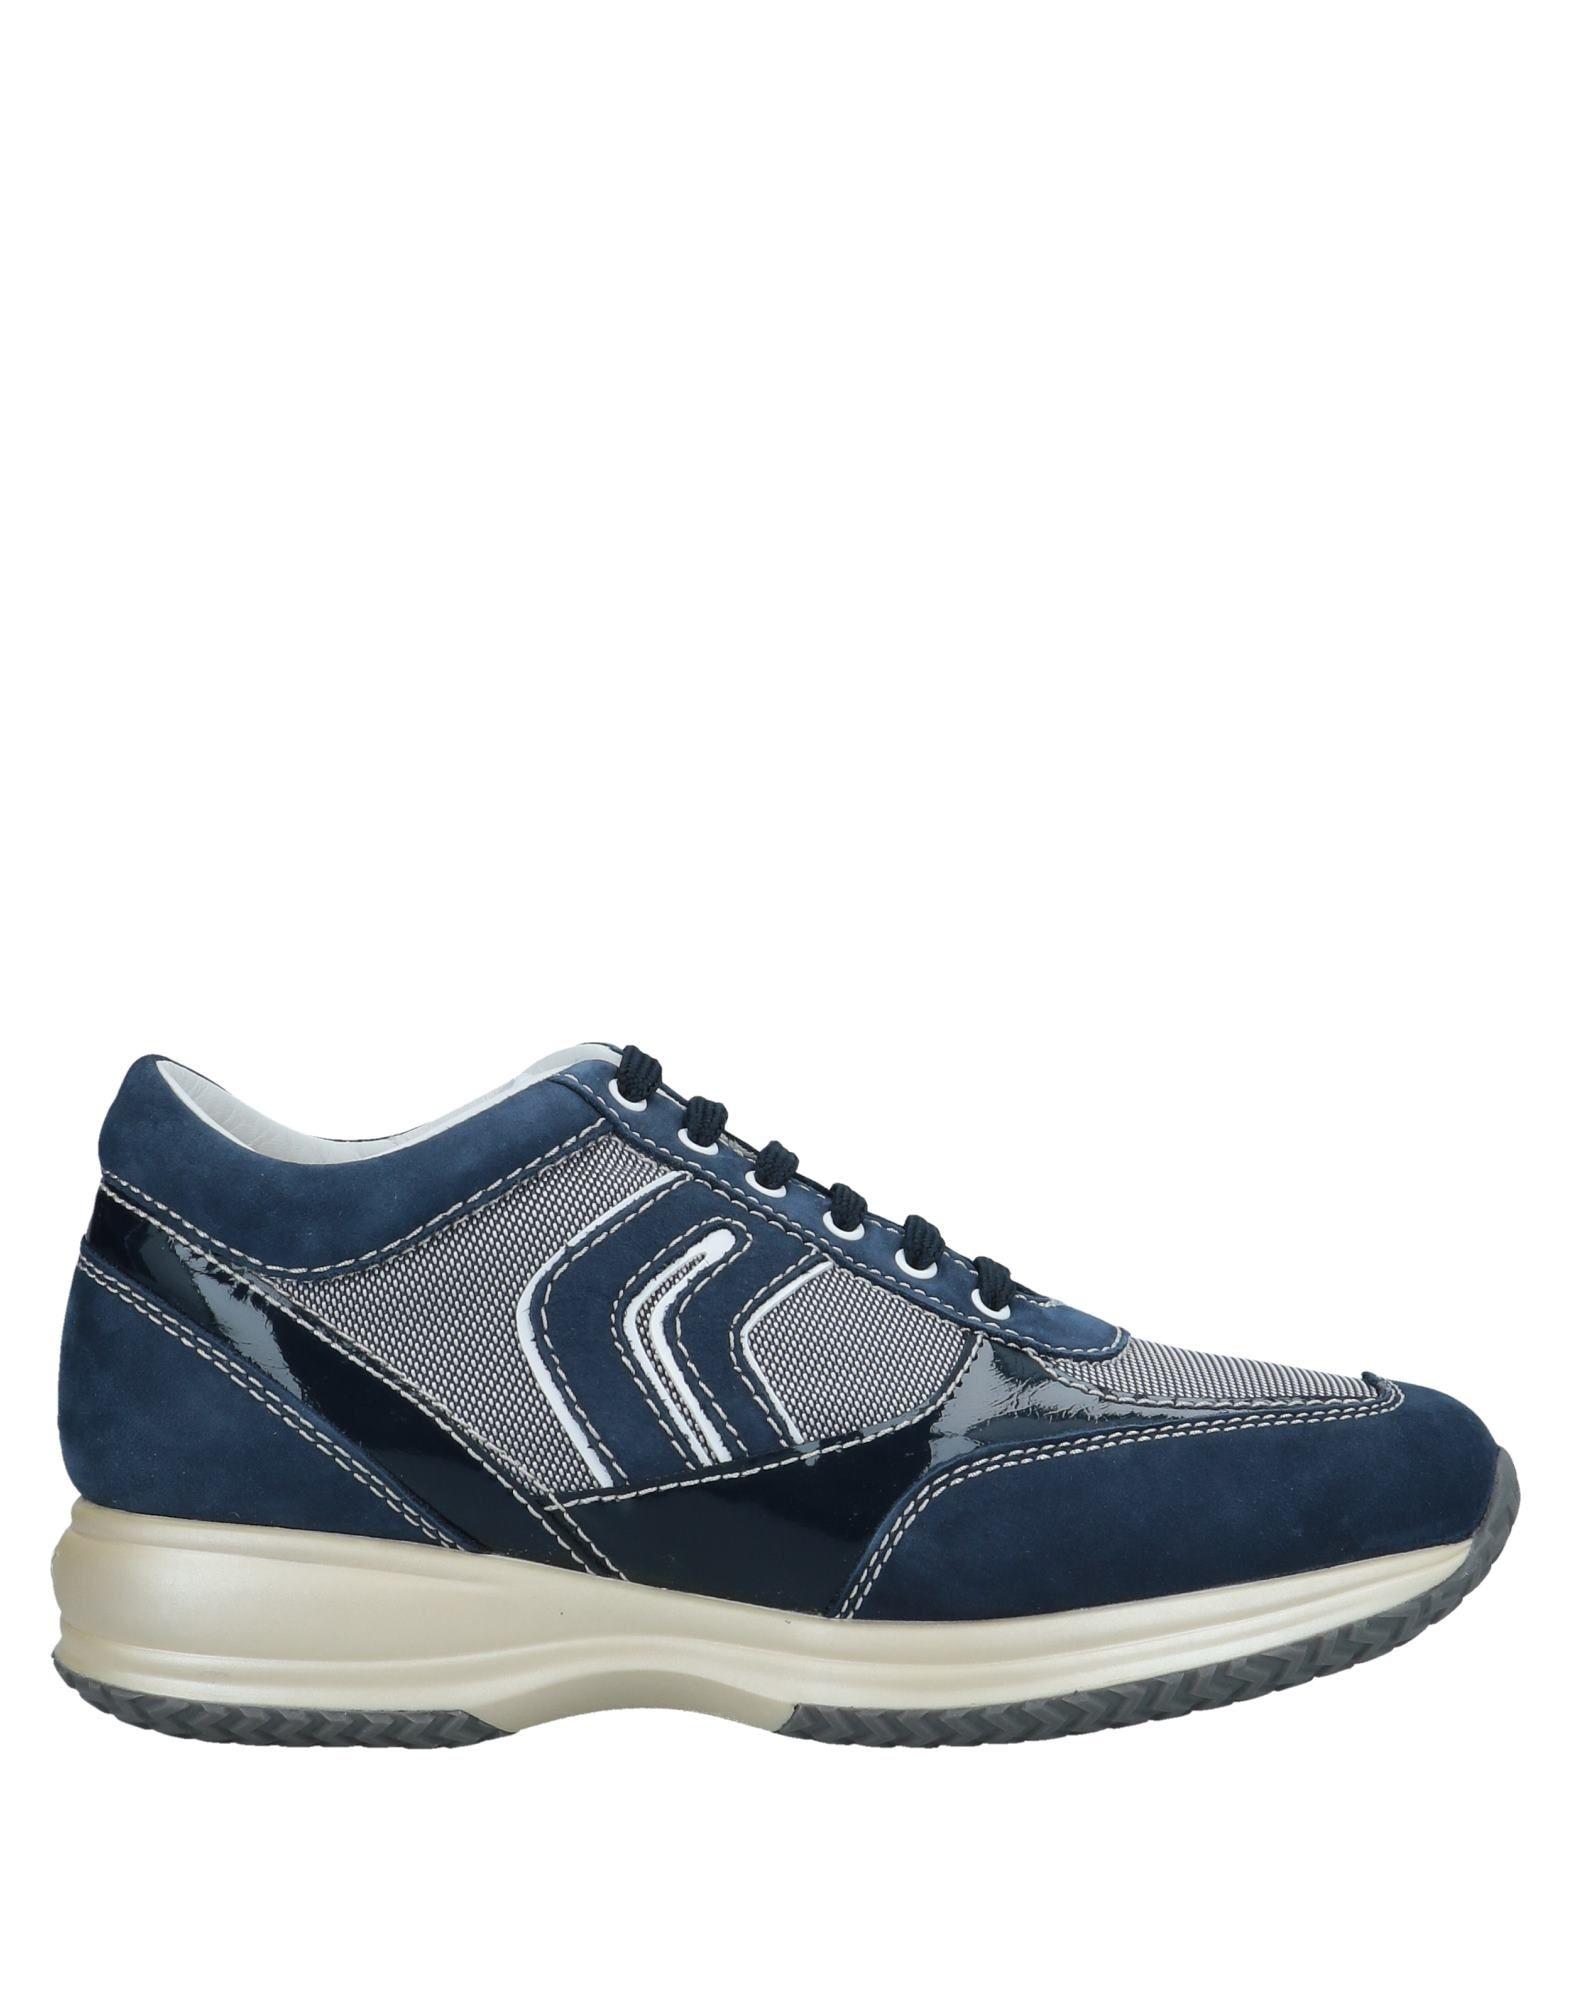 Geox Sneakers - Women Geox Sneakers online 11551500EB on  Canada - 11551500EB online db9acf